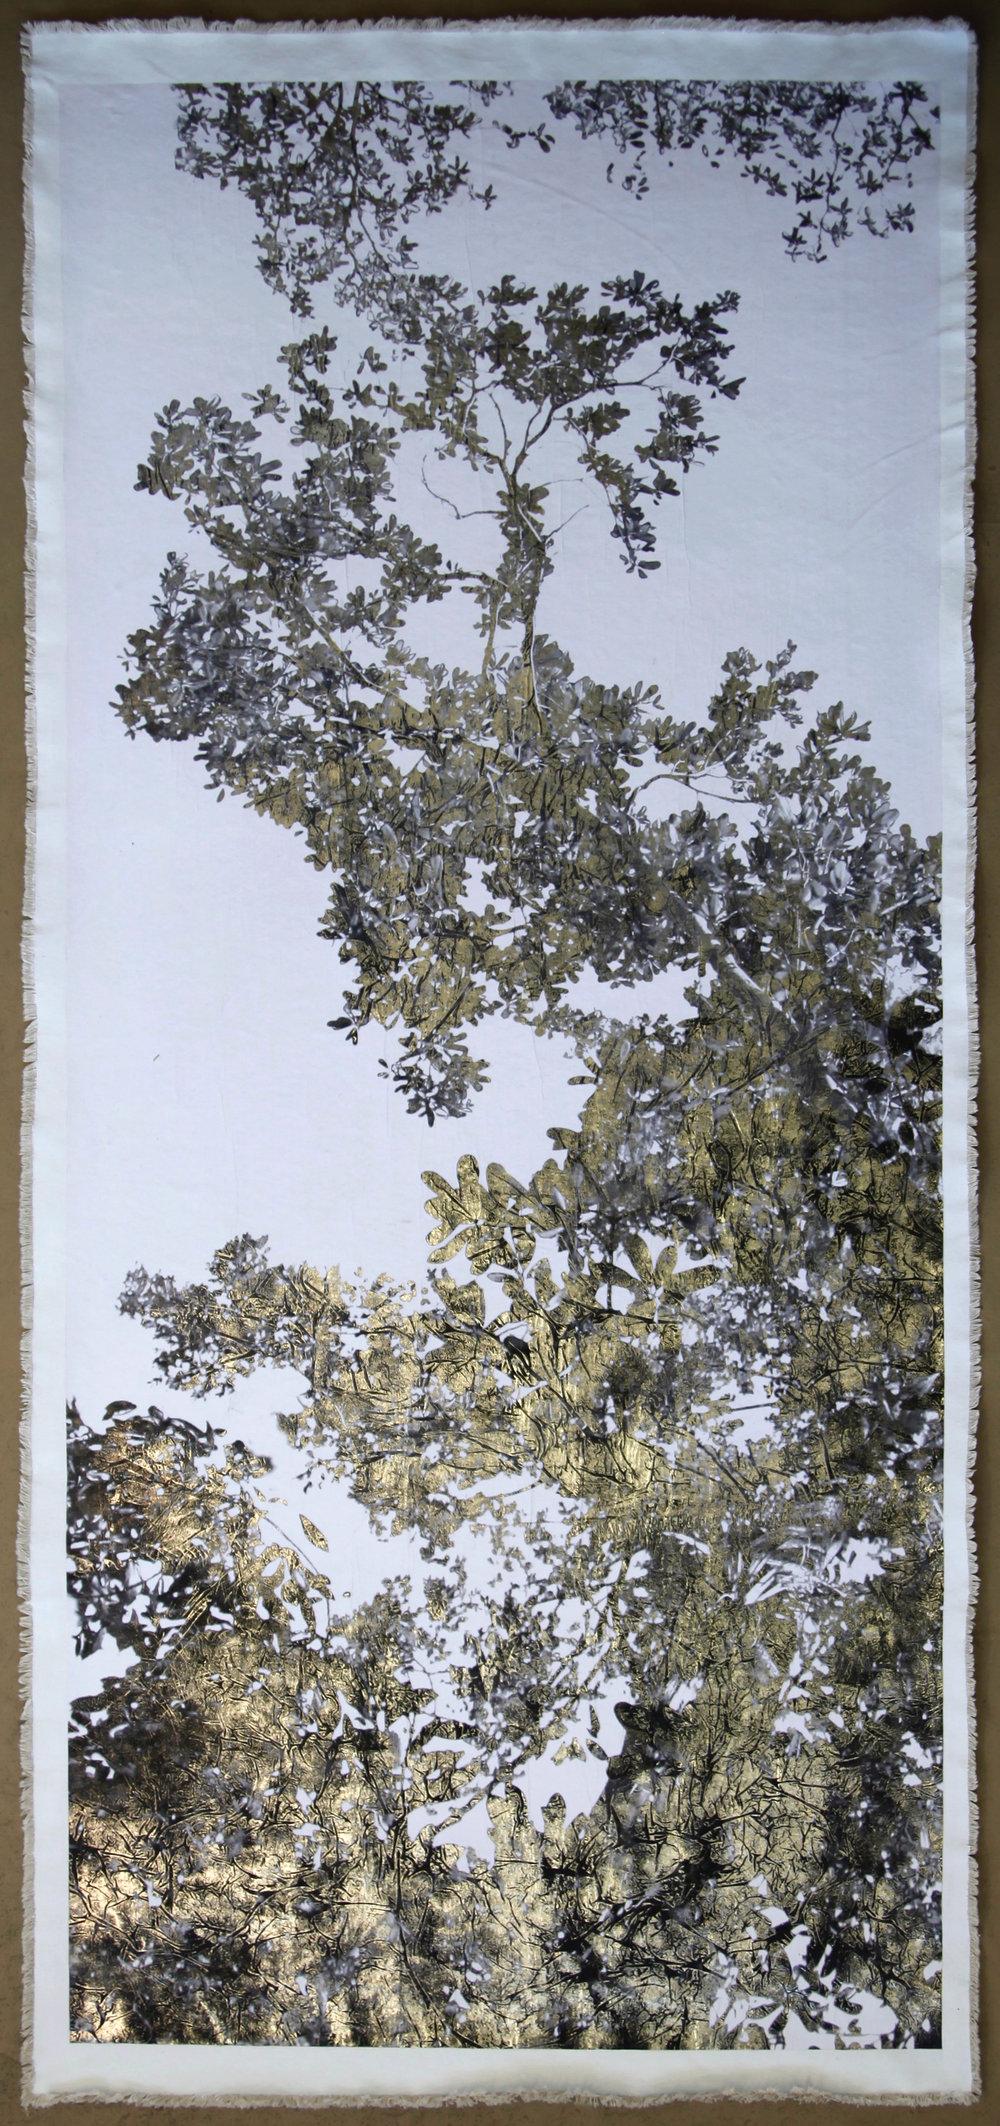 Jungle Canopy VI, Positive